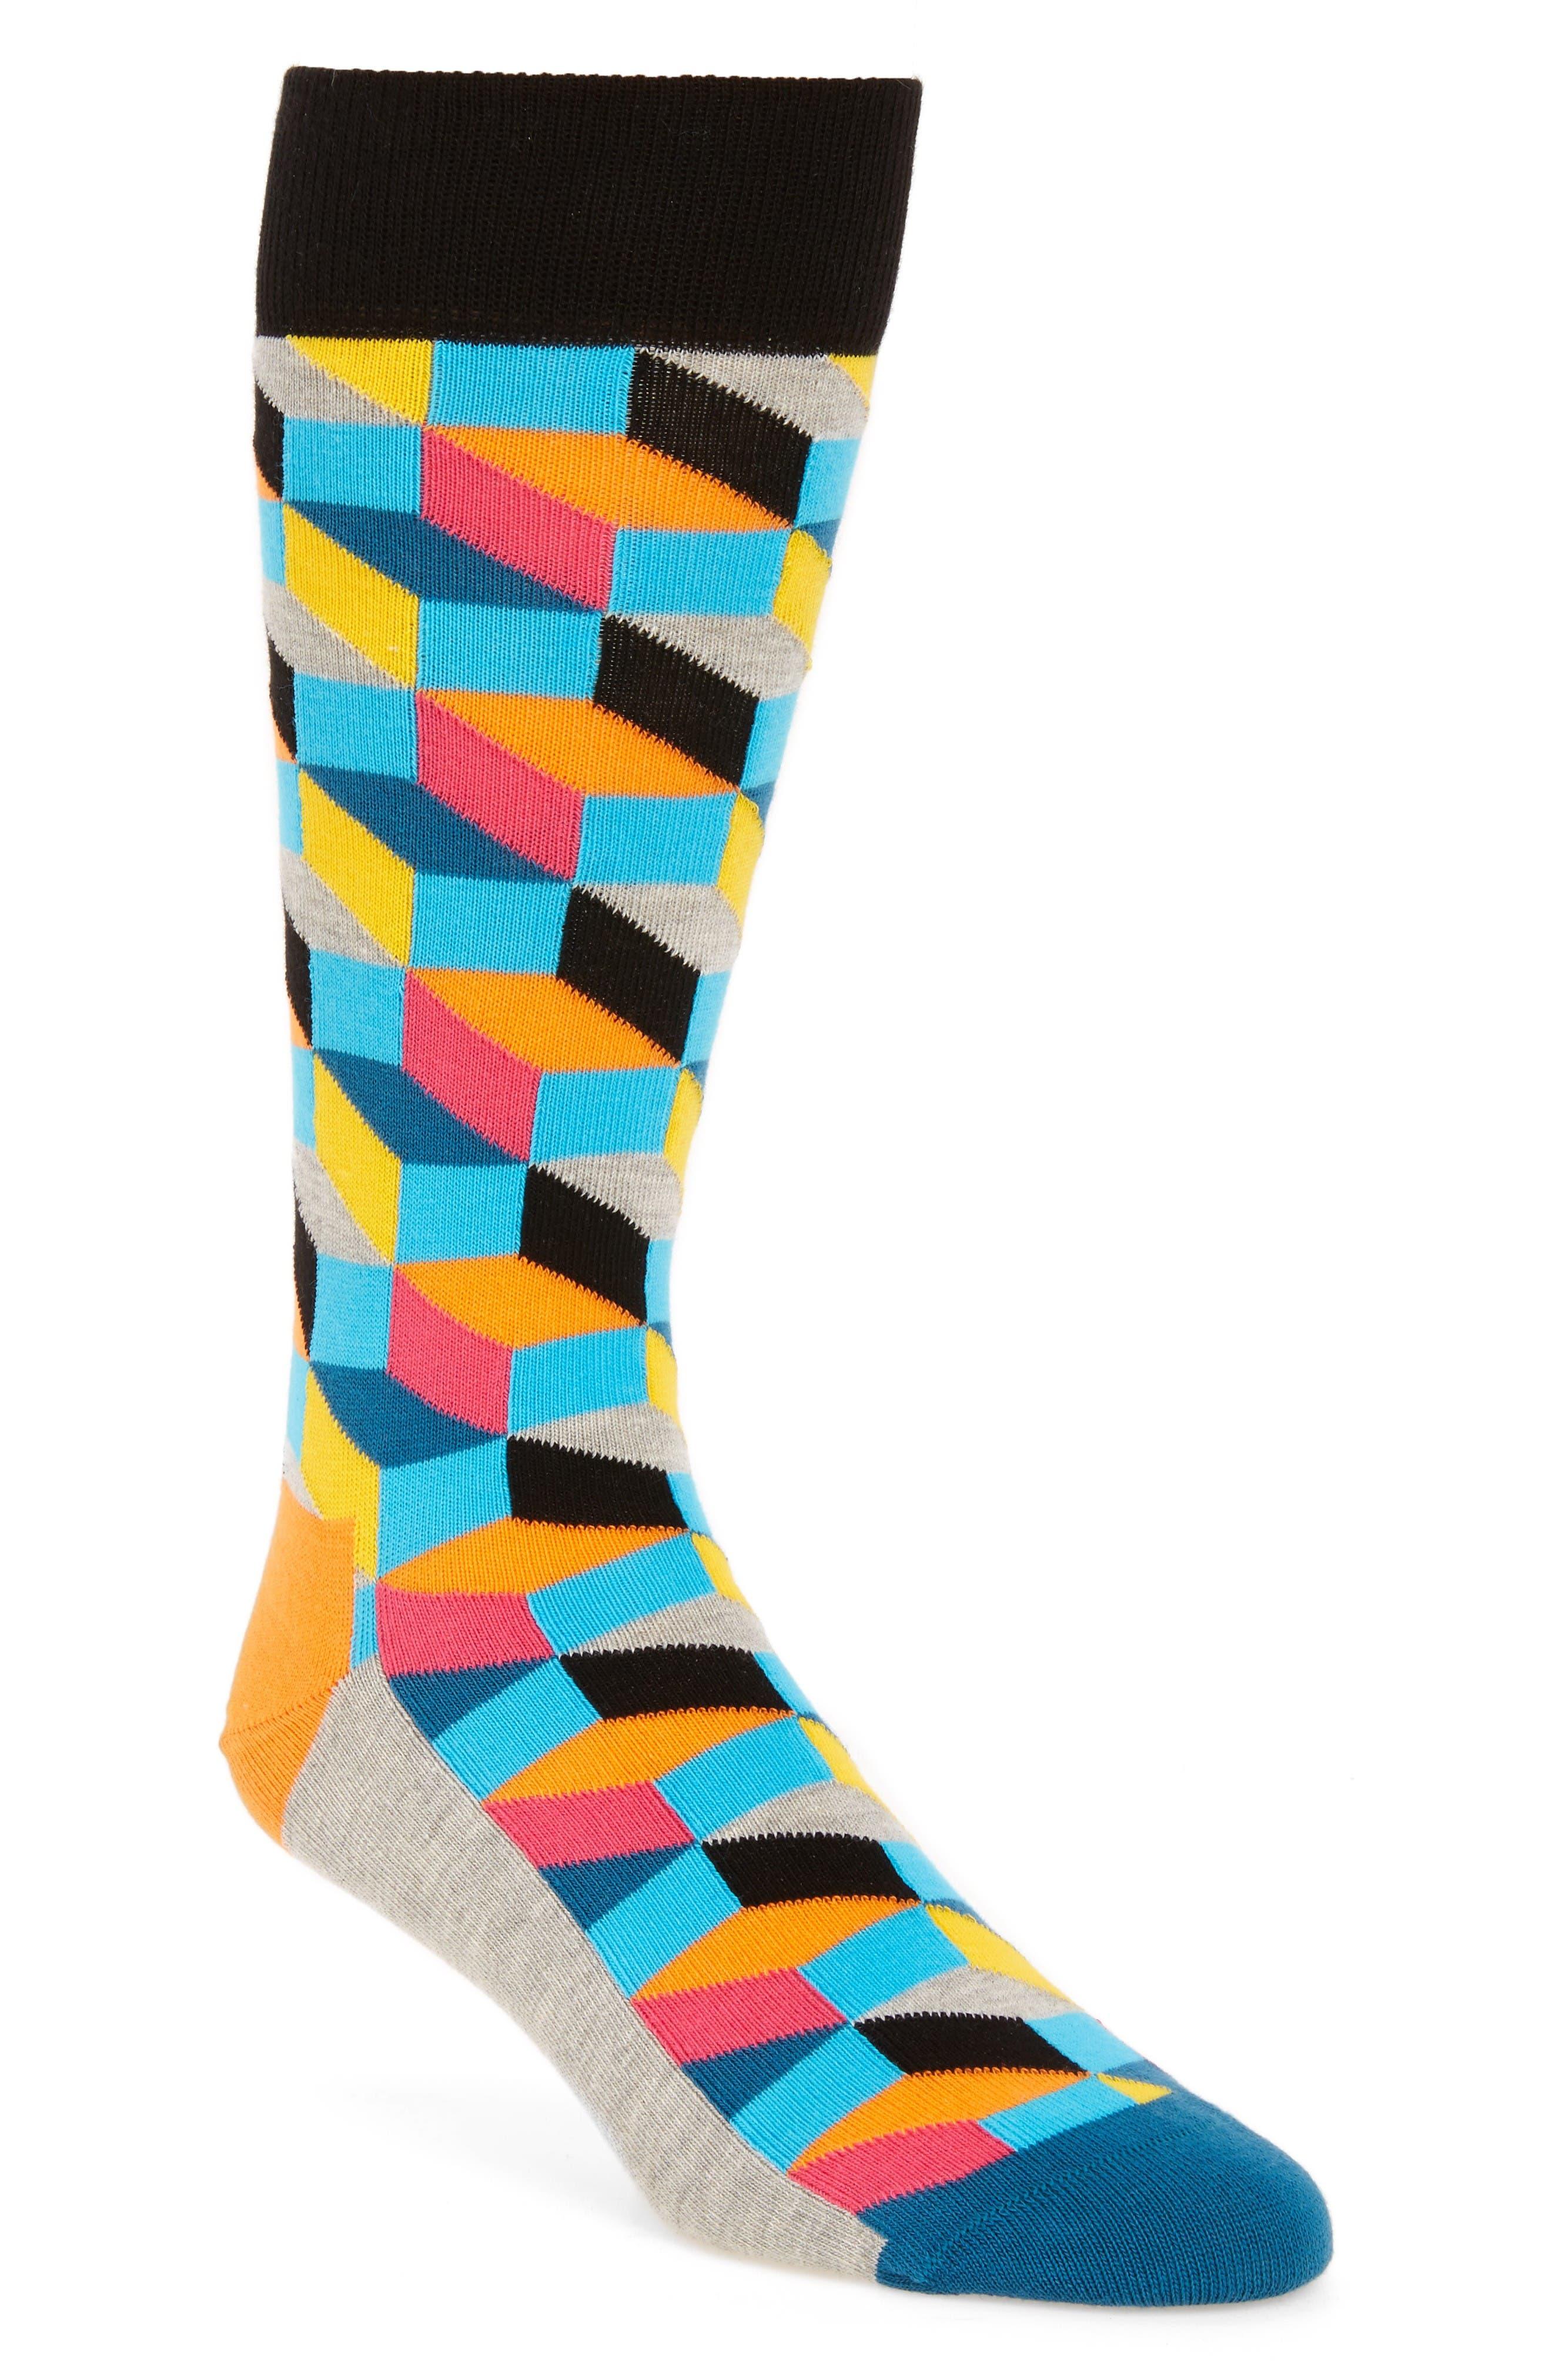 HAPPY SOCKS Geometric Cotton Blend Socks